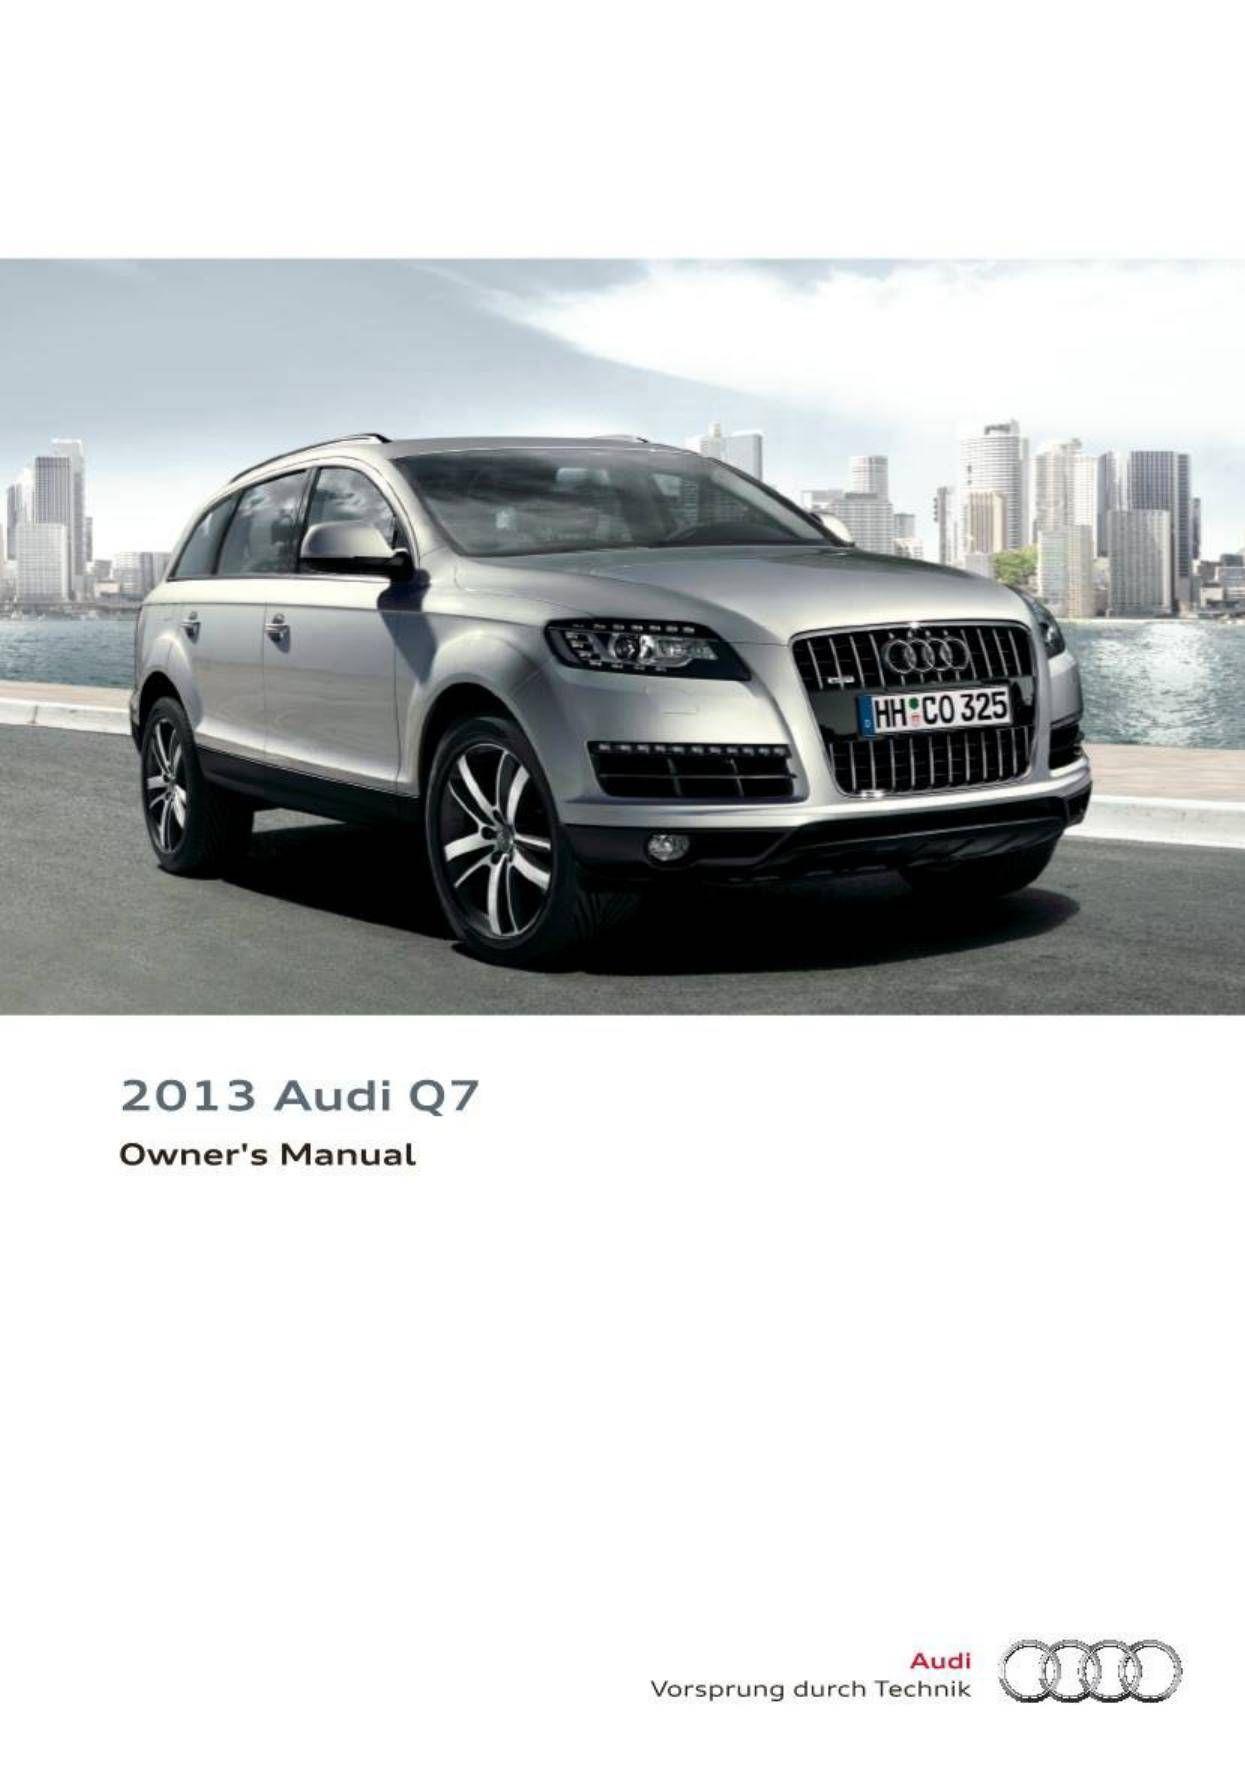 2013 audi q7 owner s manual 348 pages pdf cars vw audi rh pinterest com 2014 audi q7 owners manual pdf 2015 audi q7 owners manual